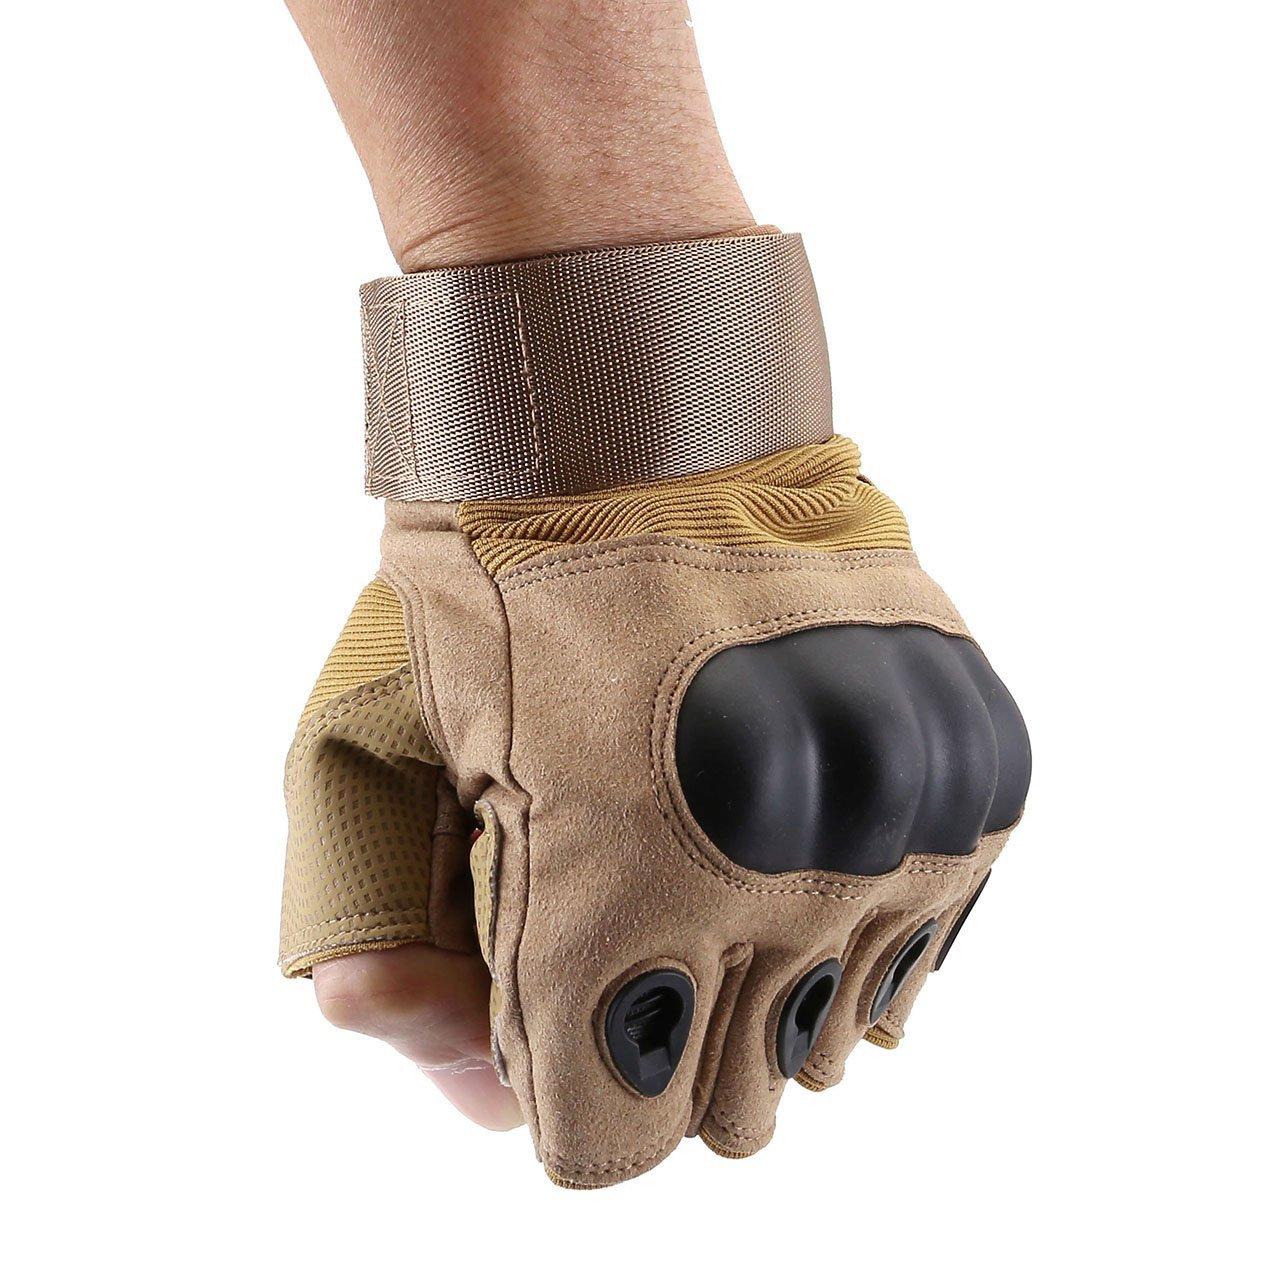 Voller Finger Army gr/ün, M Graceme Handschuhe Motorradhandschuhe f/ür MTB Mountainbike Motorrad Motocross Quad Paintball Airsoft Security Tactical Milit/är KTM Fahrrad Rad Herren Damen Touchscreen